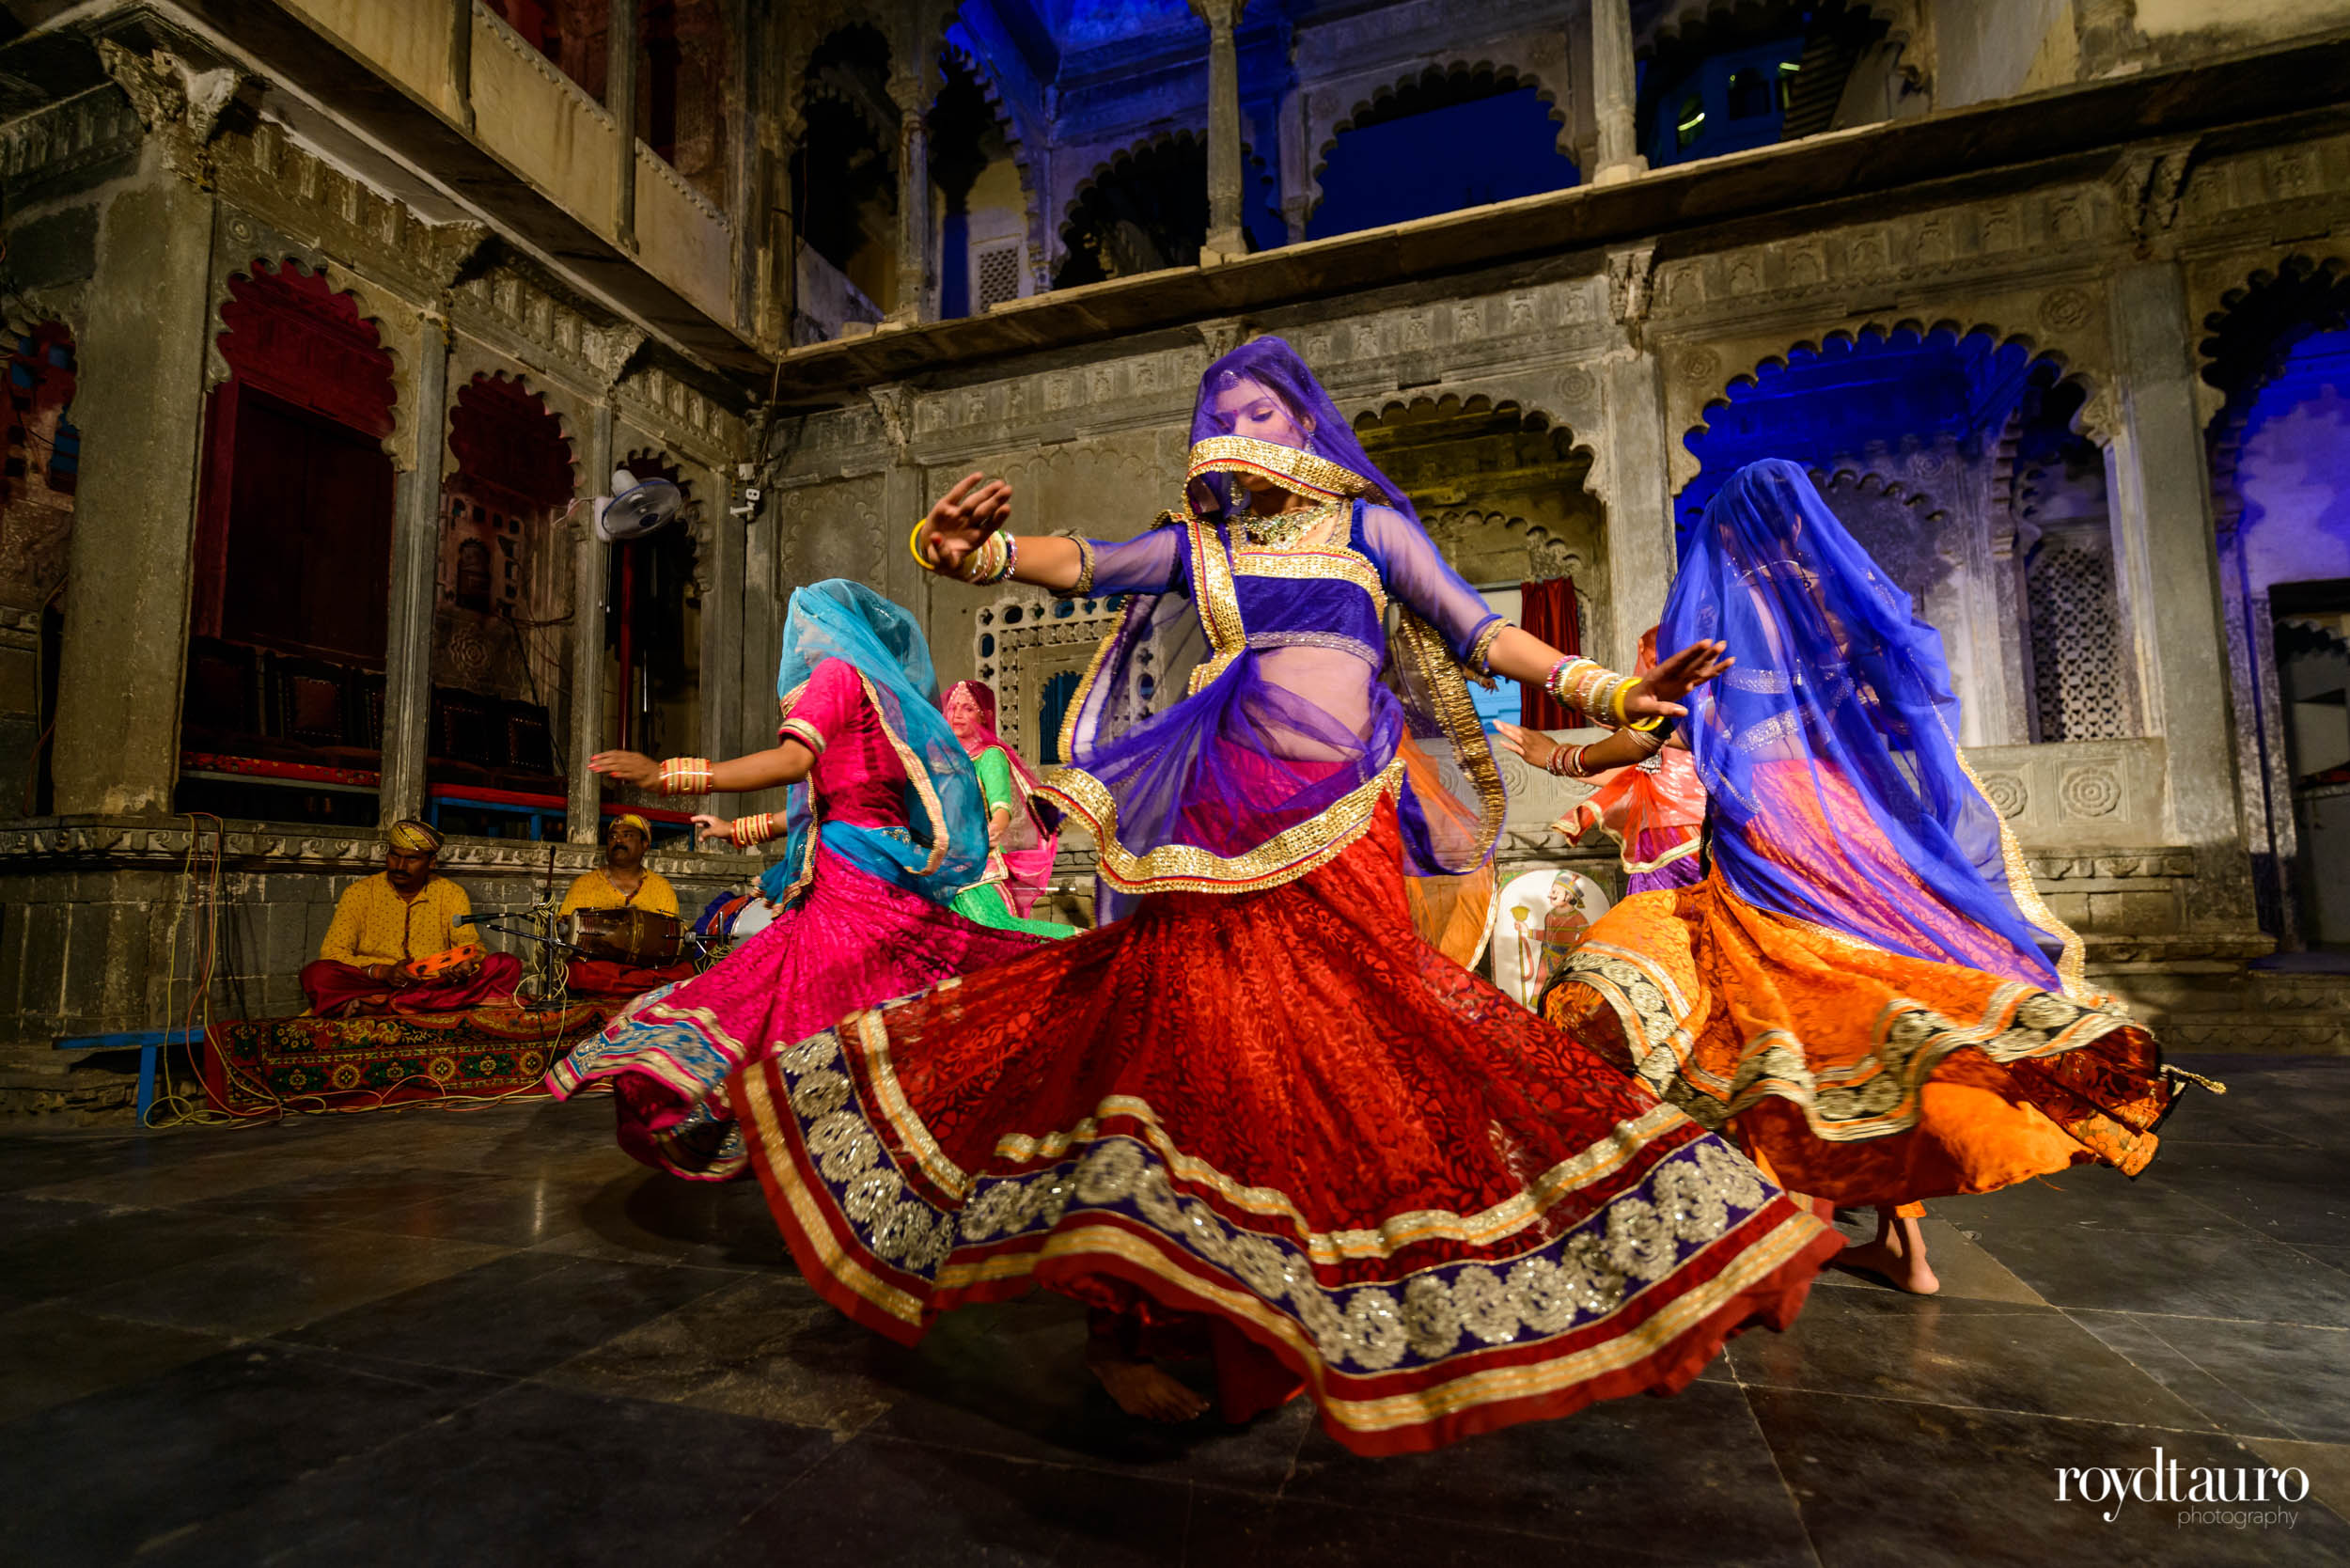 ghoomar-udaipur-bagore-ki-haveli.jpg